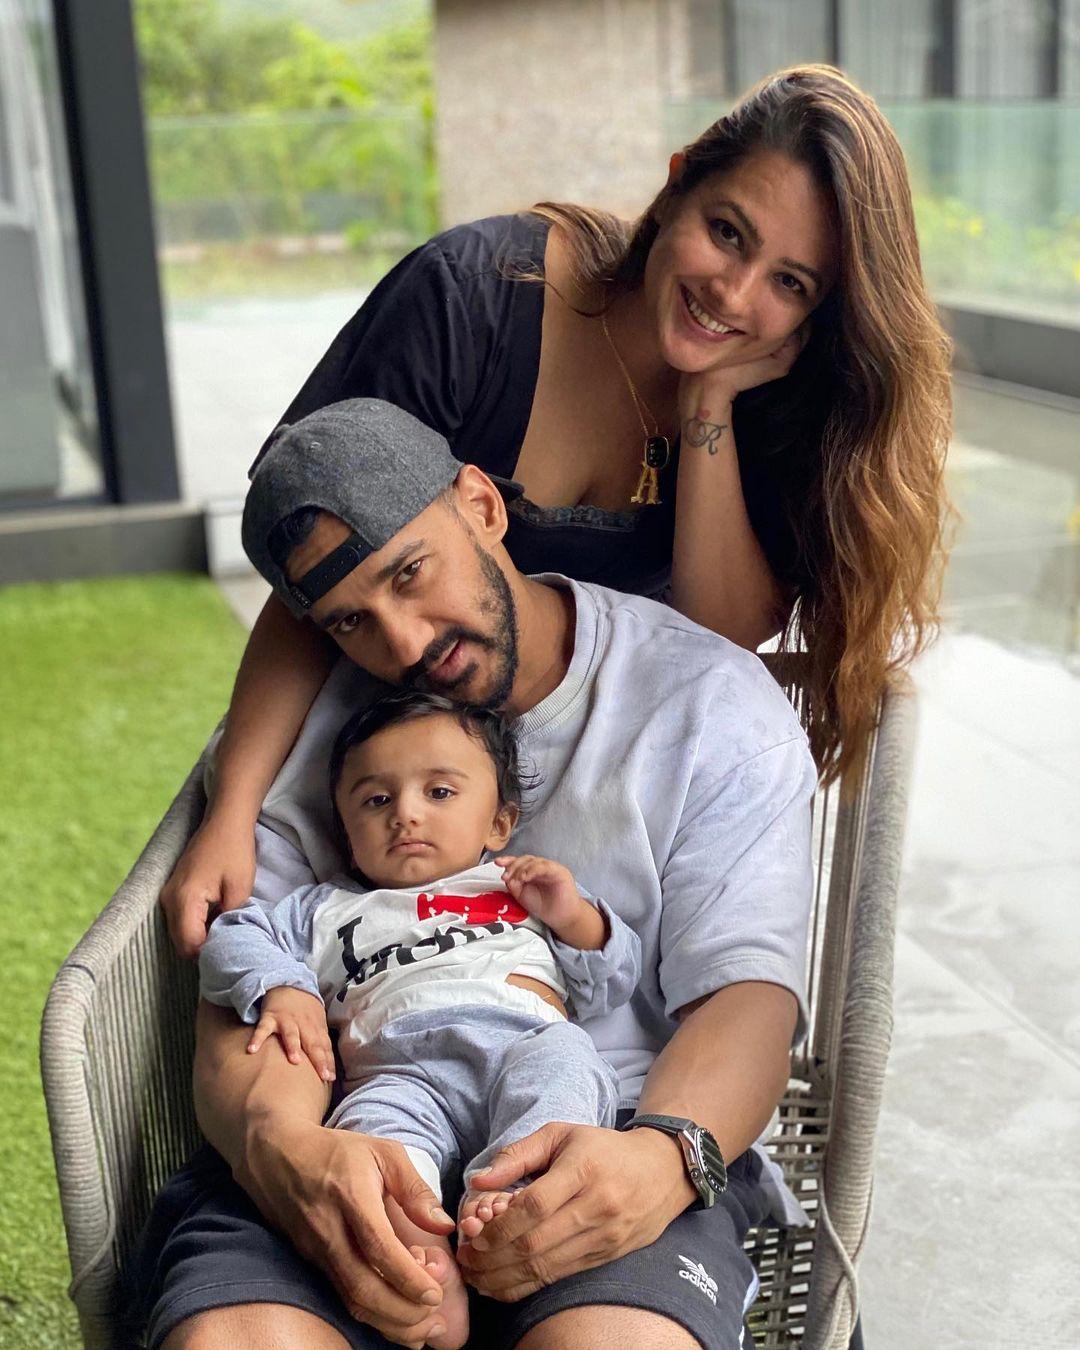 Anita Hassanandani With Baby And Husband